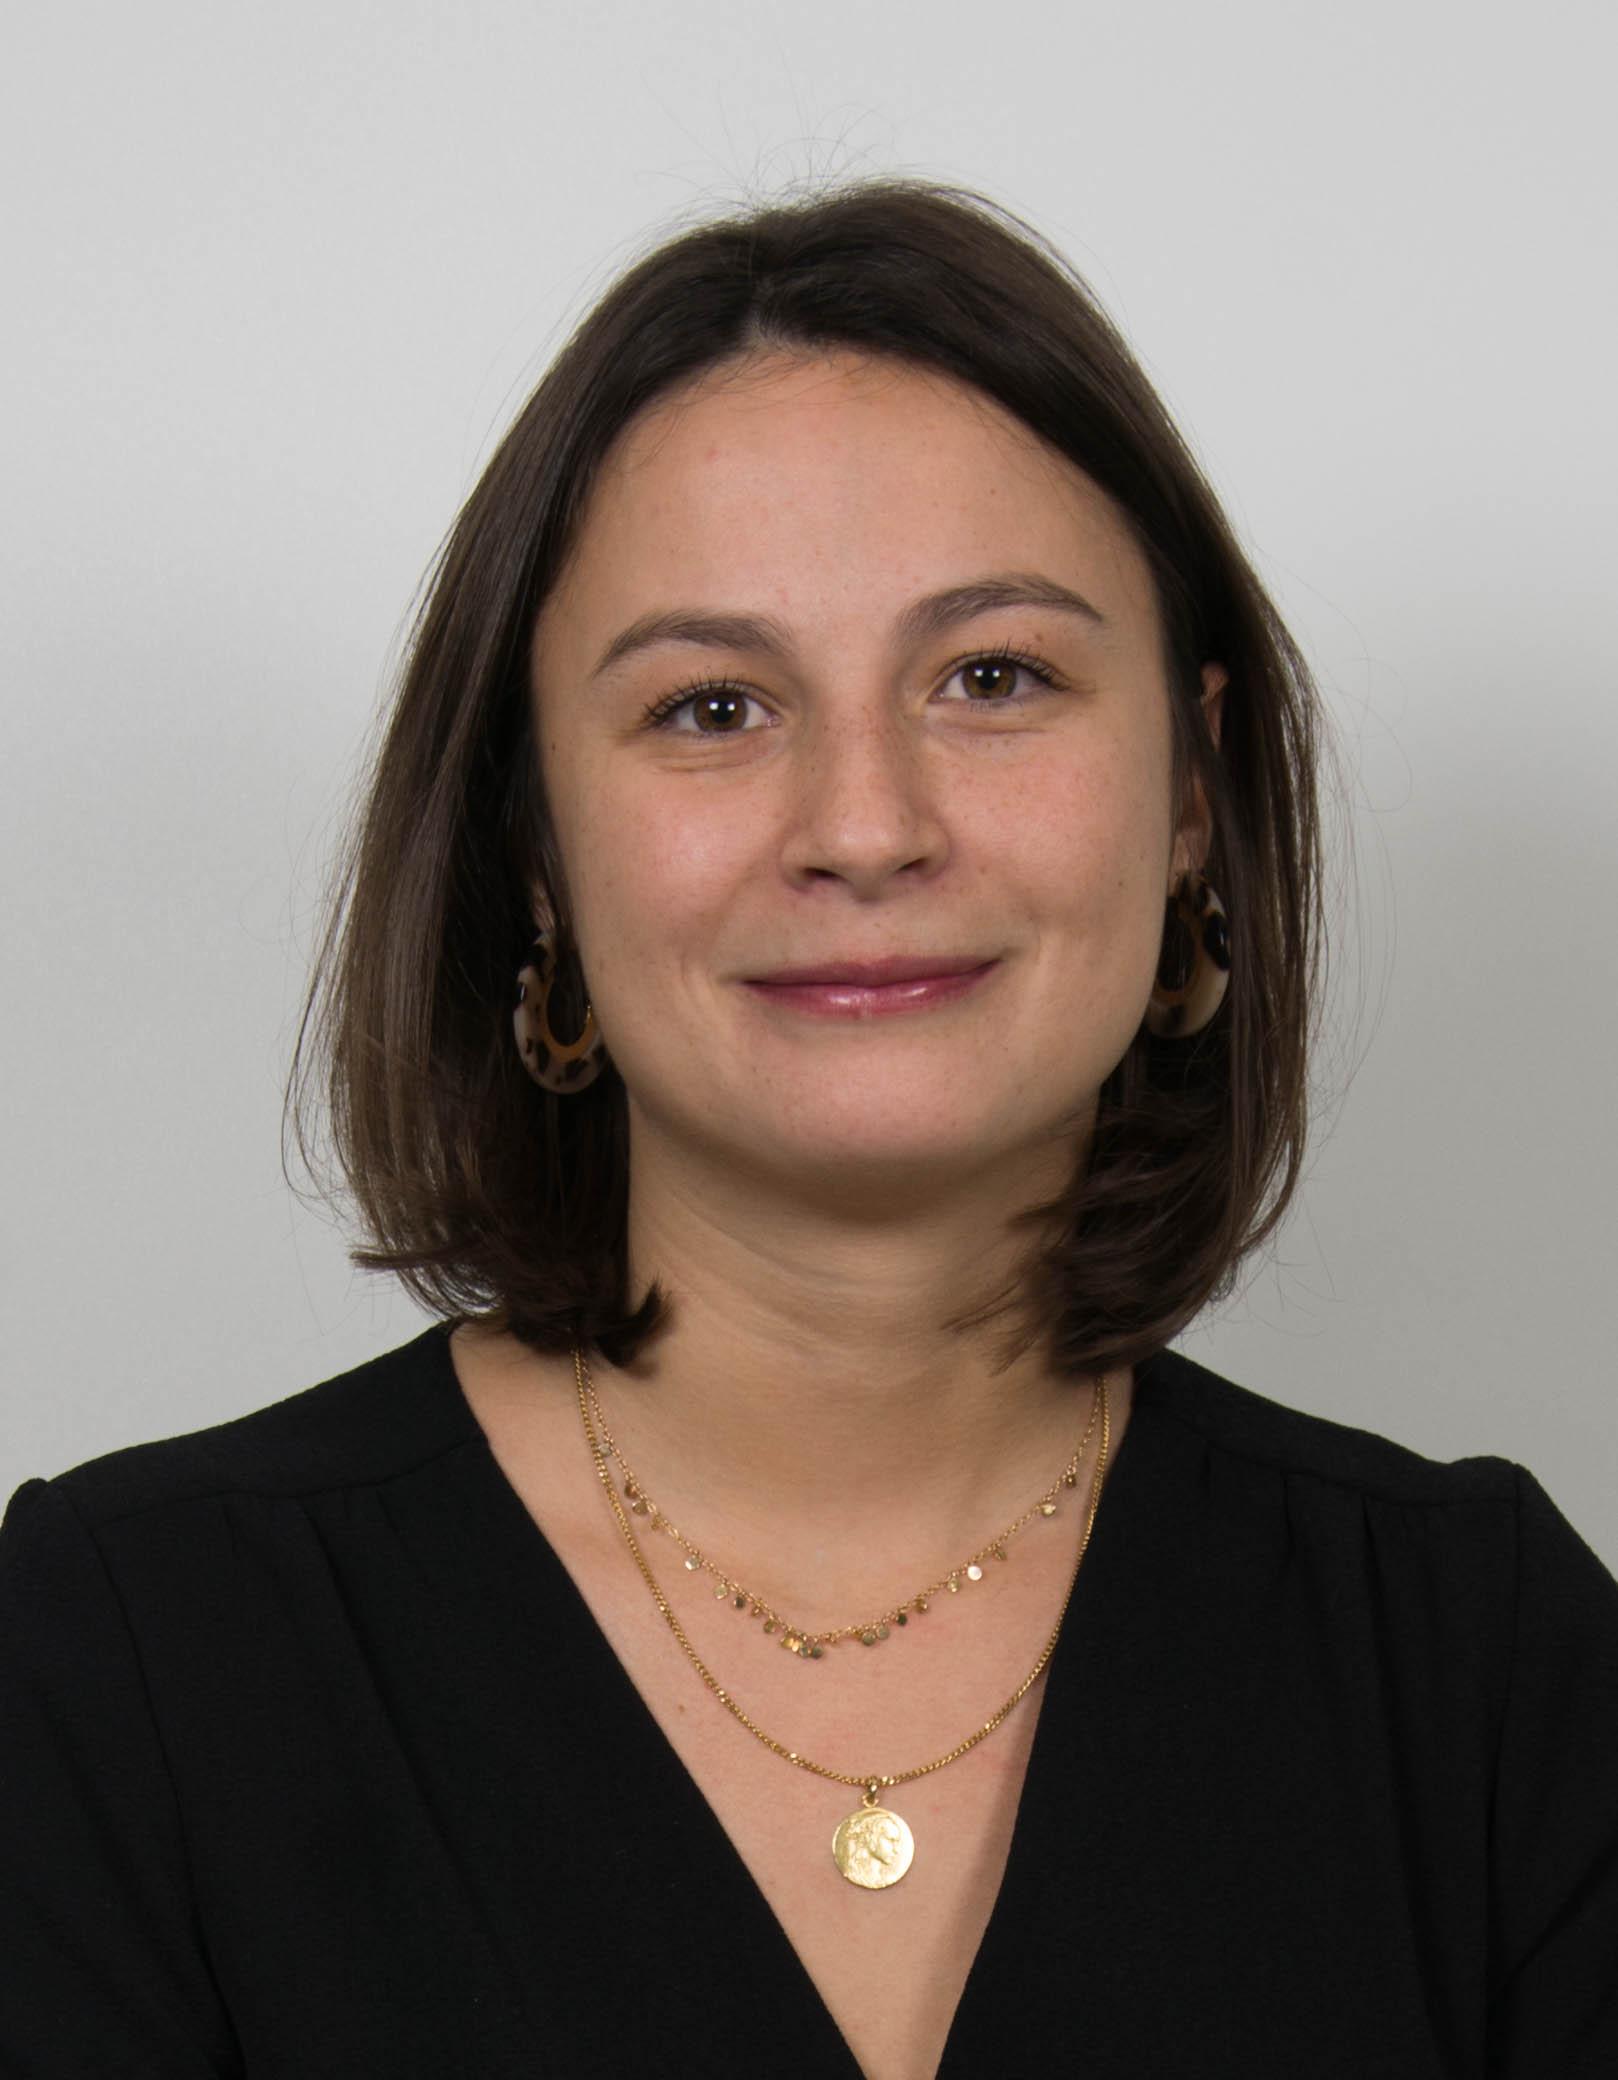 Léa Vacherot